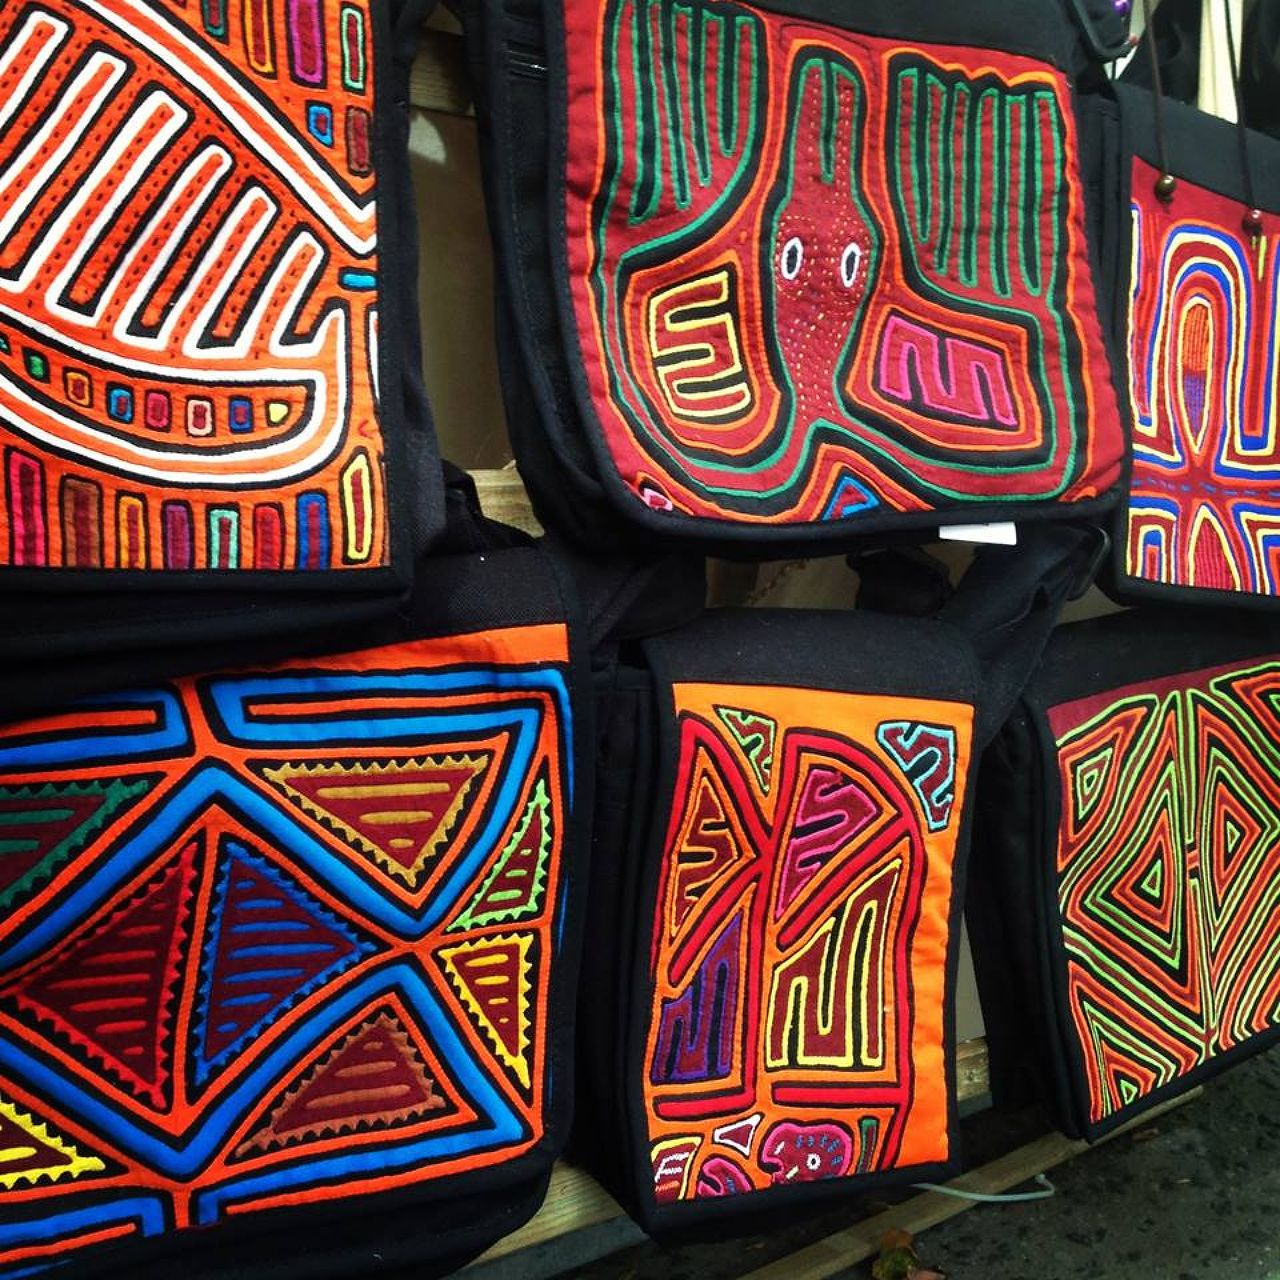 Photo 1 of Aruaco Gallery